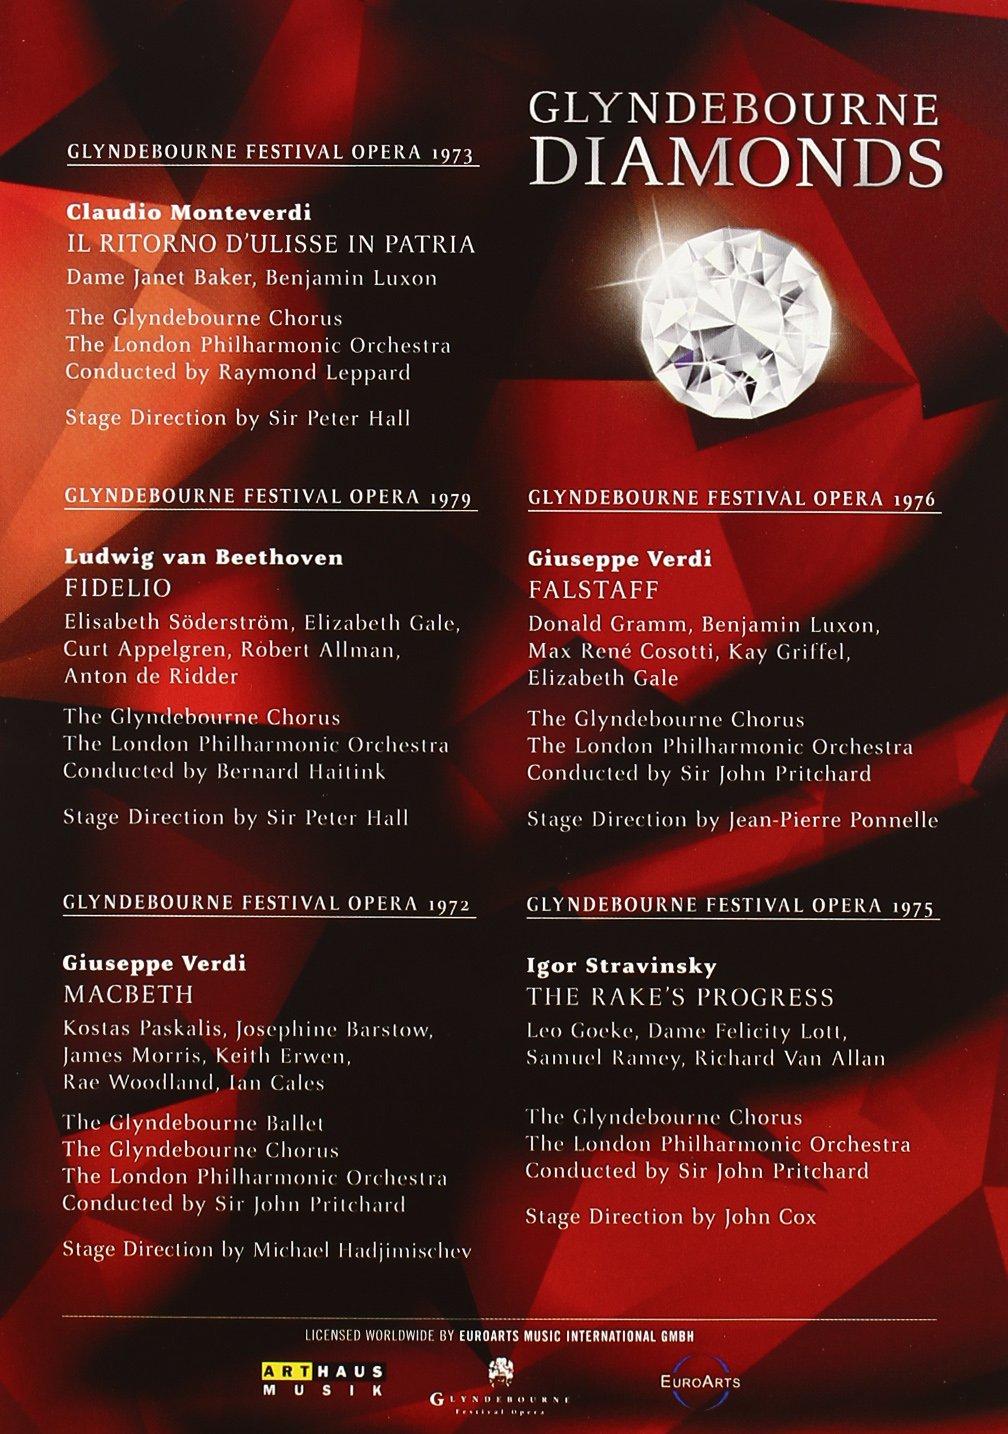 Glyndebourne Diamonds: Fidelio, Falstaff, Macbeth, The Rake's Progress, Il Ritorno d'Ulisse in Patria by DVD International